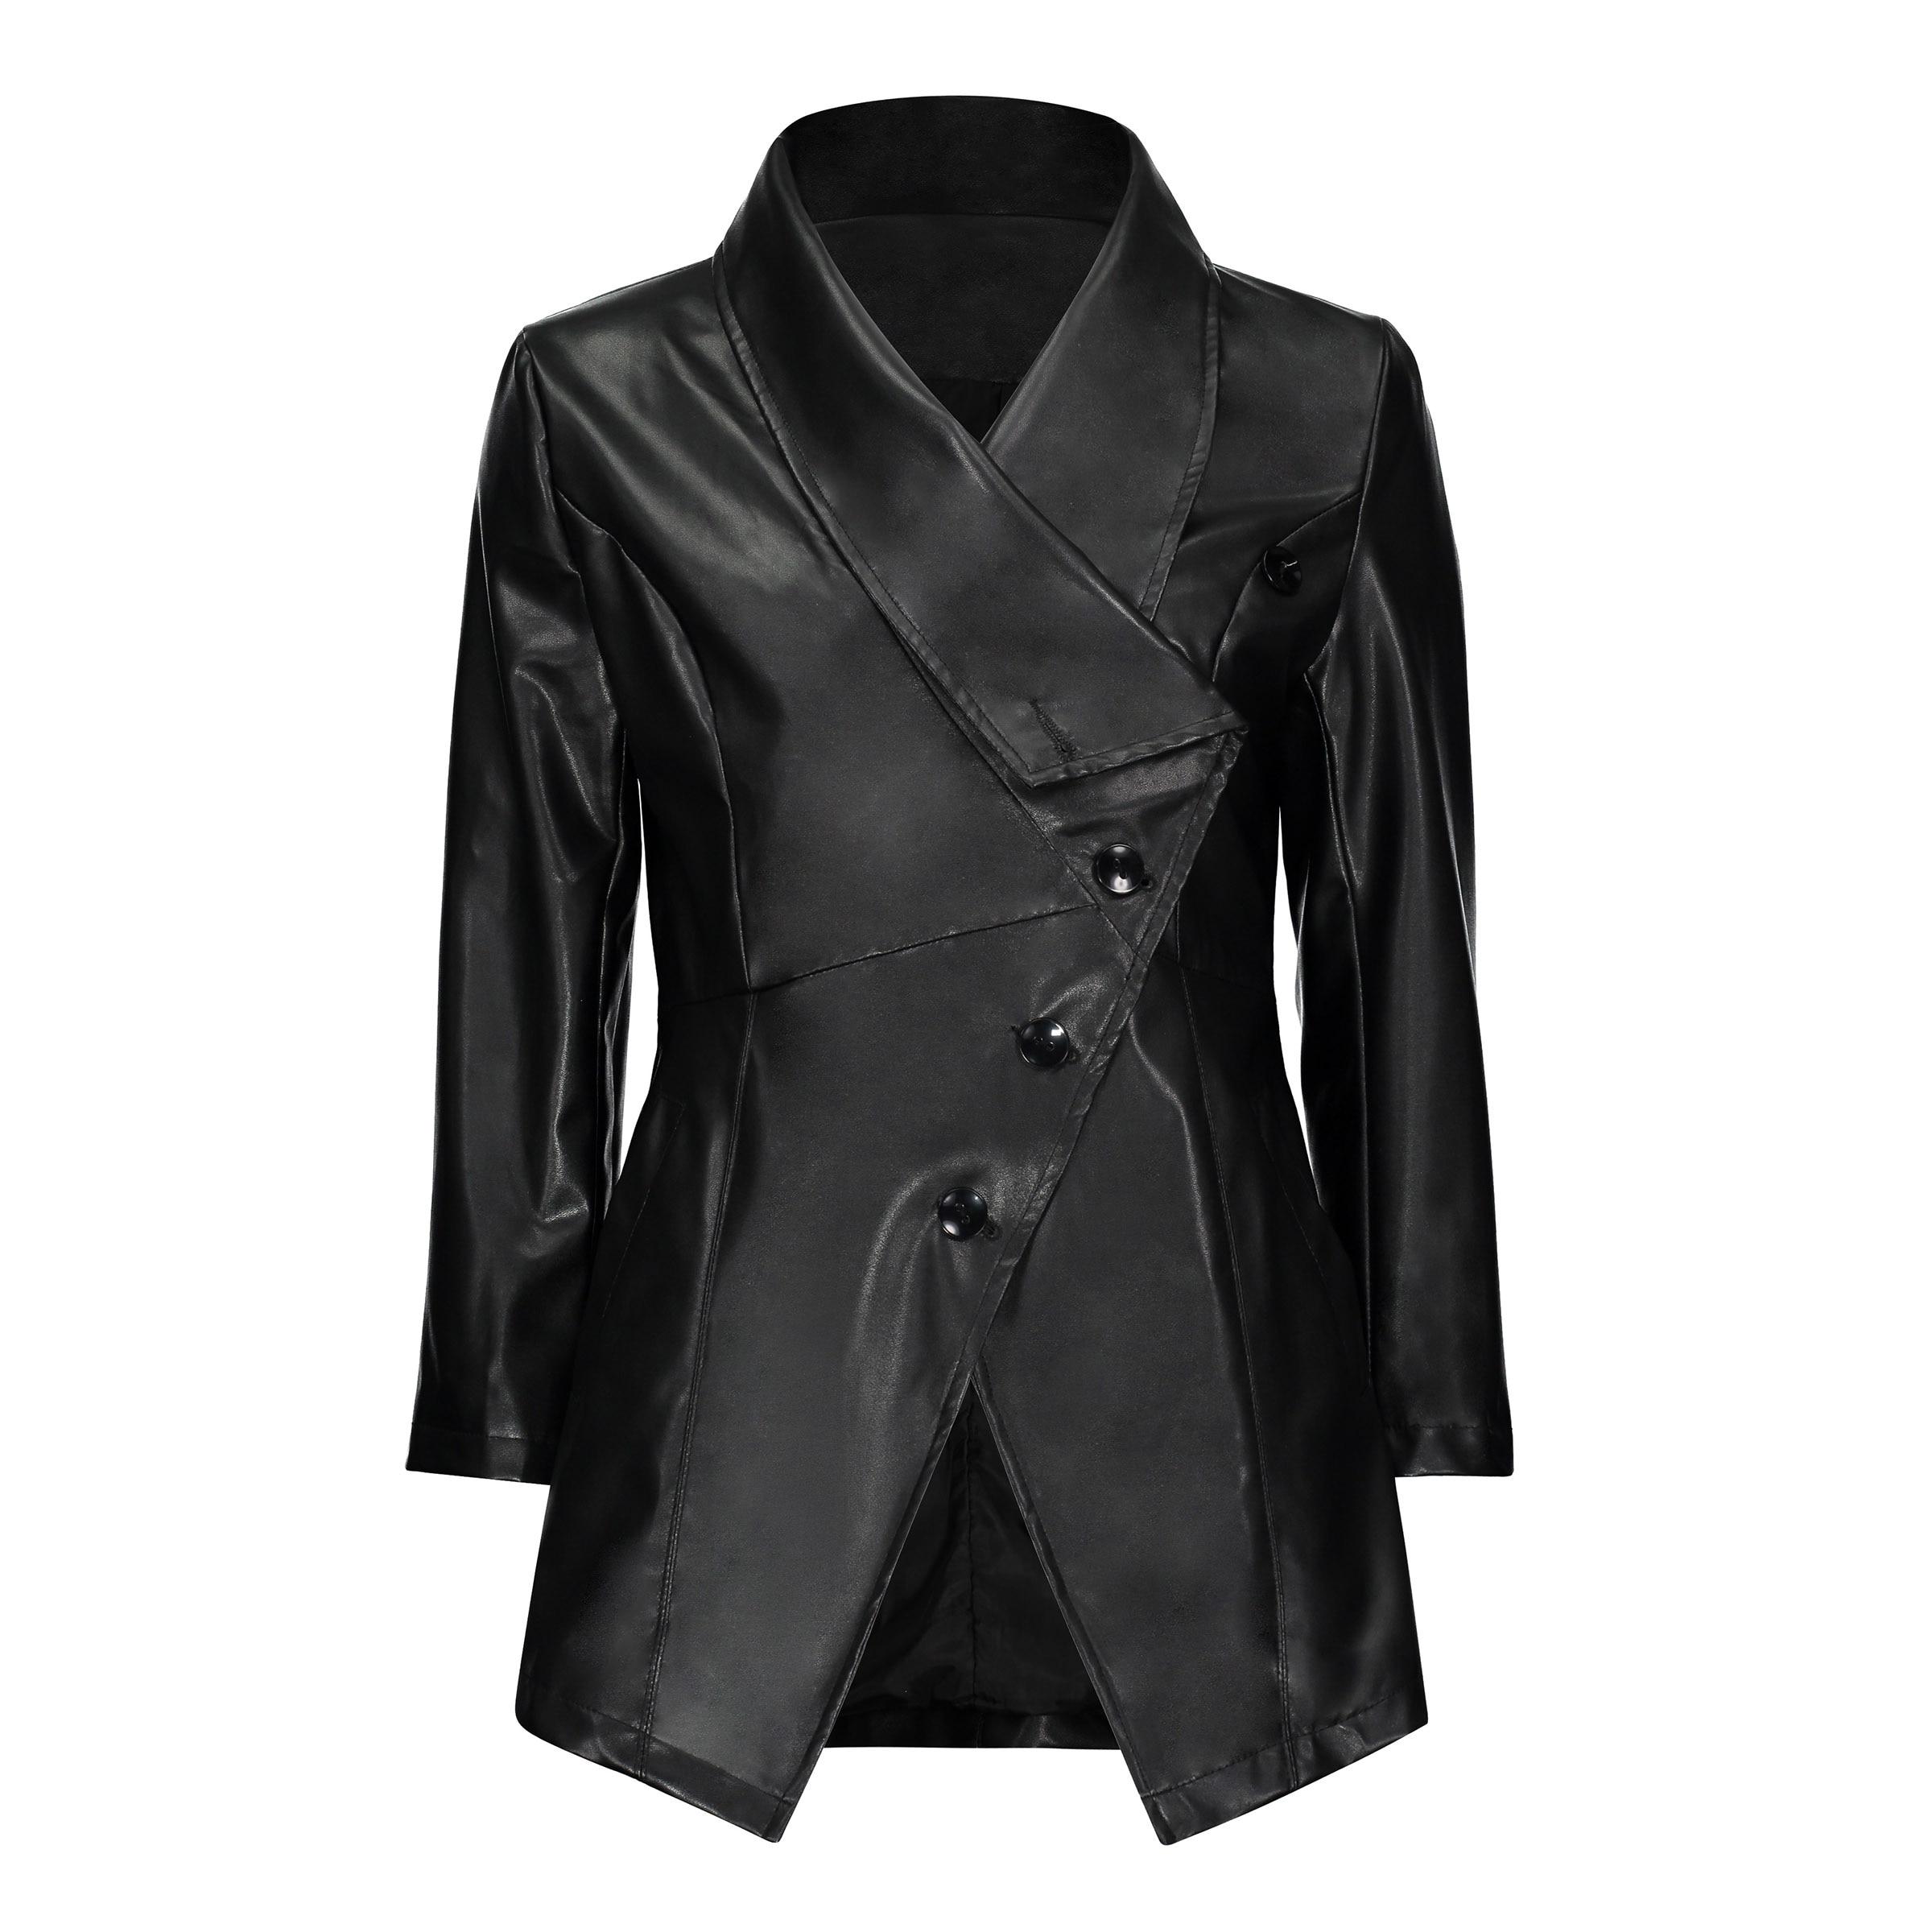 Black Autumn jacket Women Gothic faux   leather   Winter zipper Mid-long Outerwear Motorcycle faux   leather   PU Jacket 2018 Coat HOT